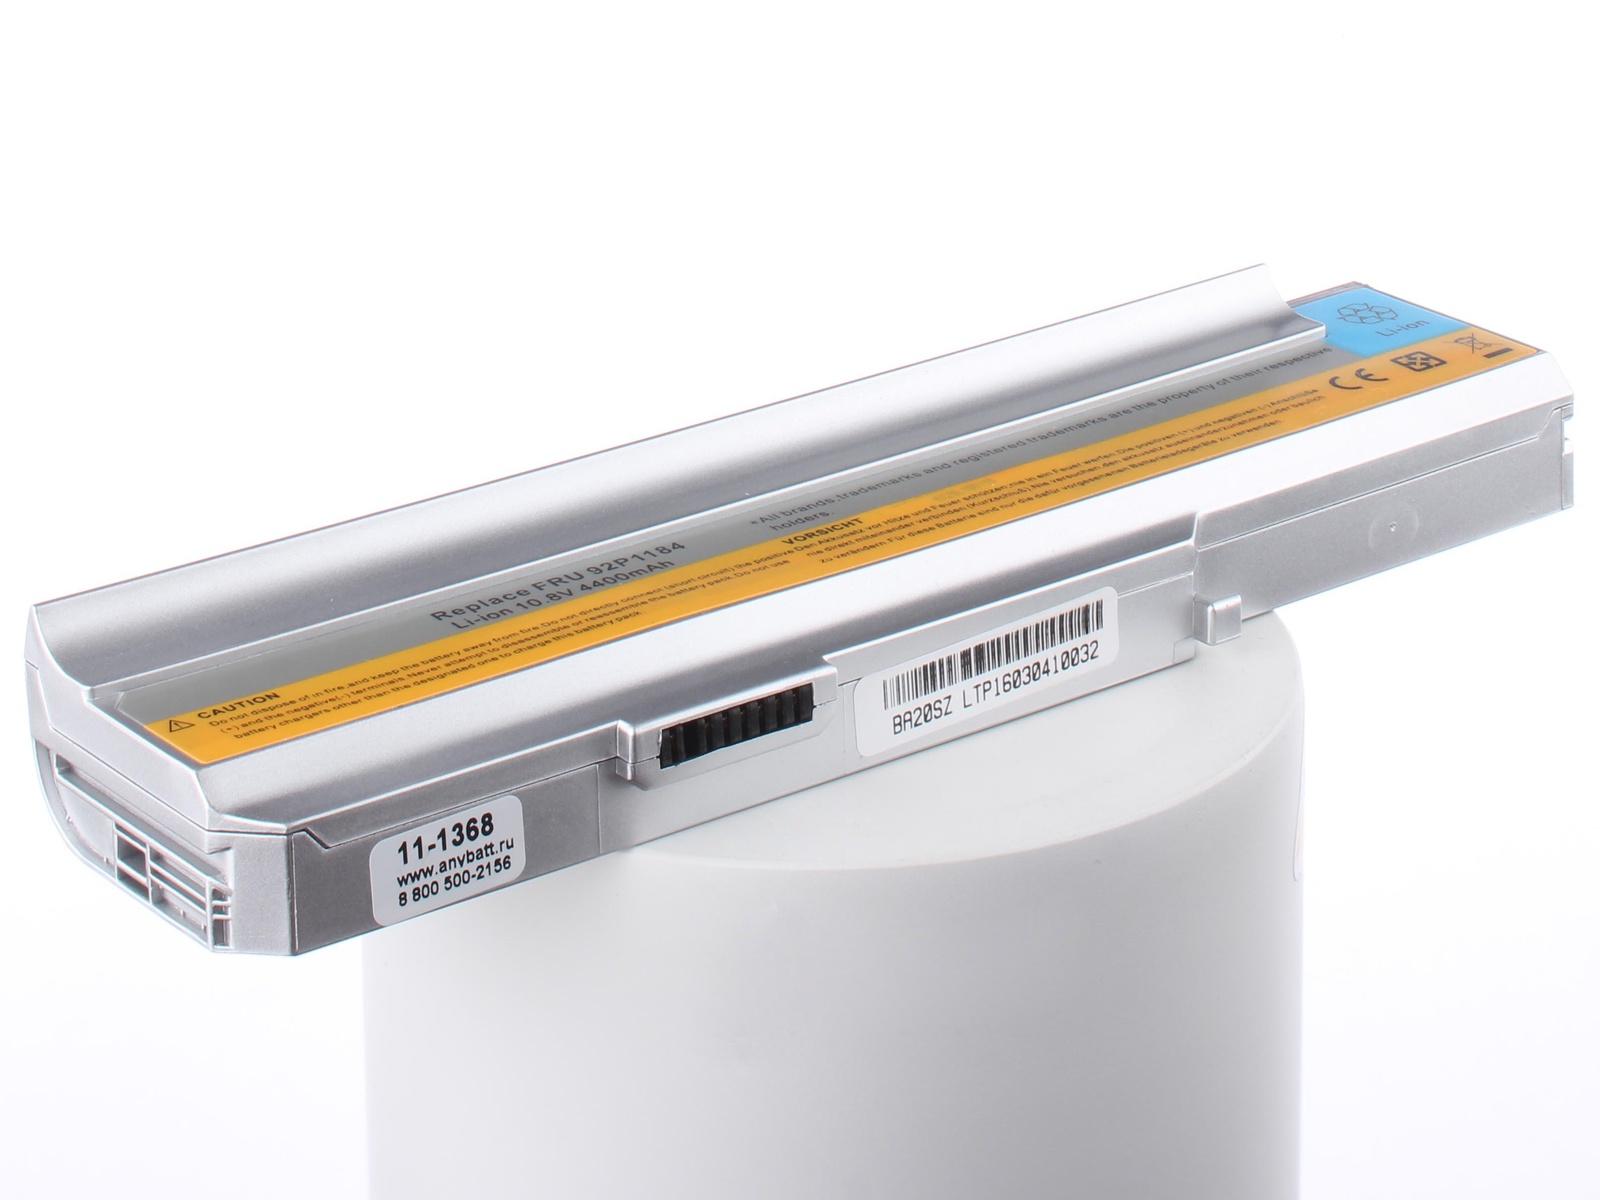 Аккумуляторная батарея AnyBatt 11-A1-1368 4400mAh для ноутбуков iBM-Lenovo 40Y8315, 40Y8322, 40Y8317, аккумуляторная батарея lenovo thinkpad battery 68 6cell для ноутбуков lenovo x240 t440 t440s 0c5286